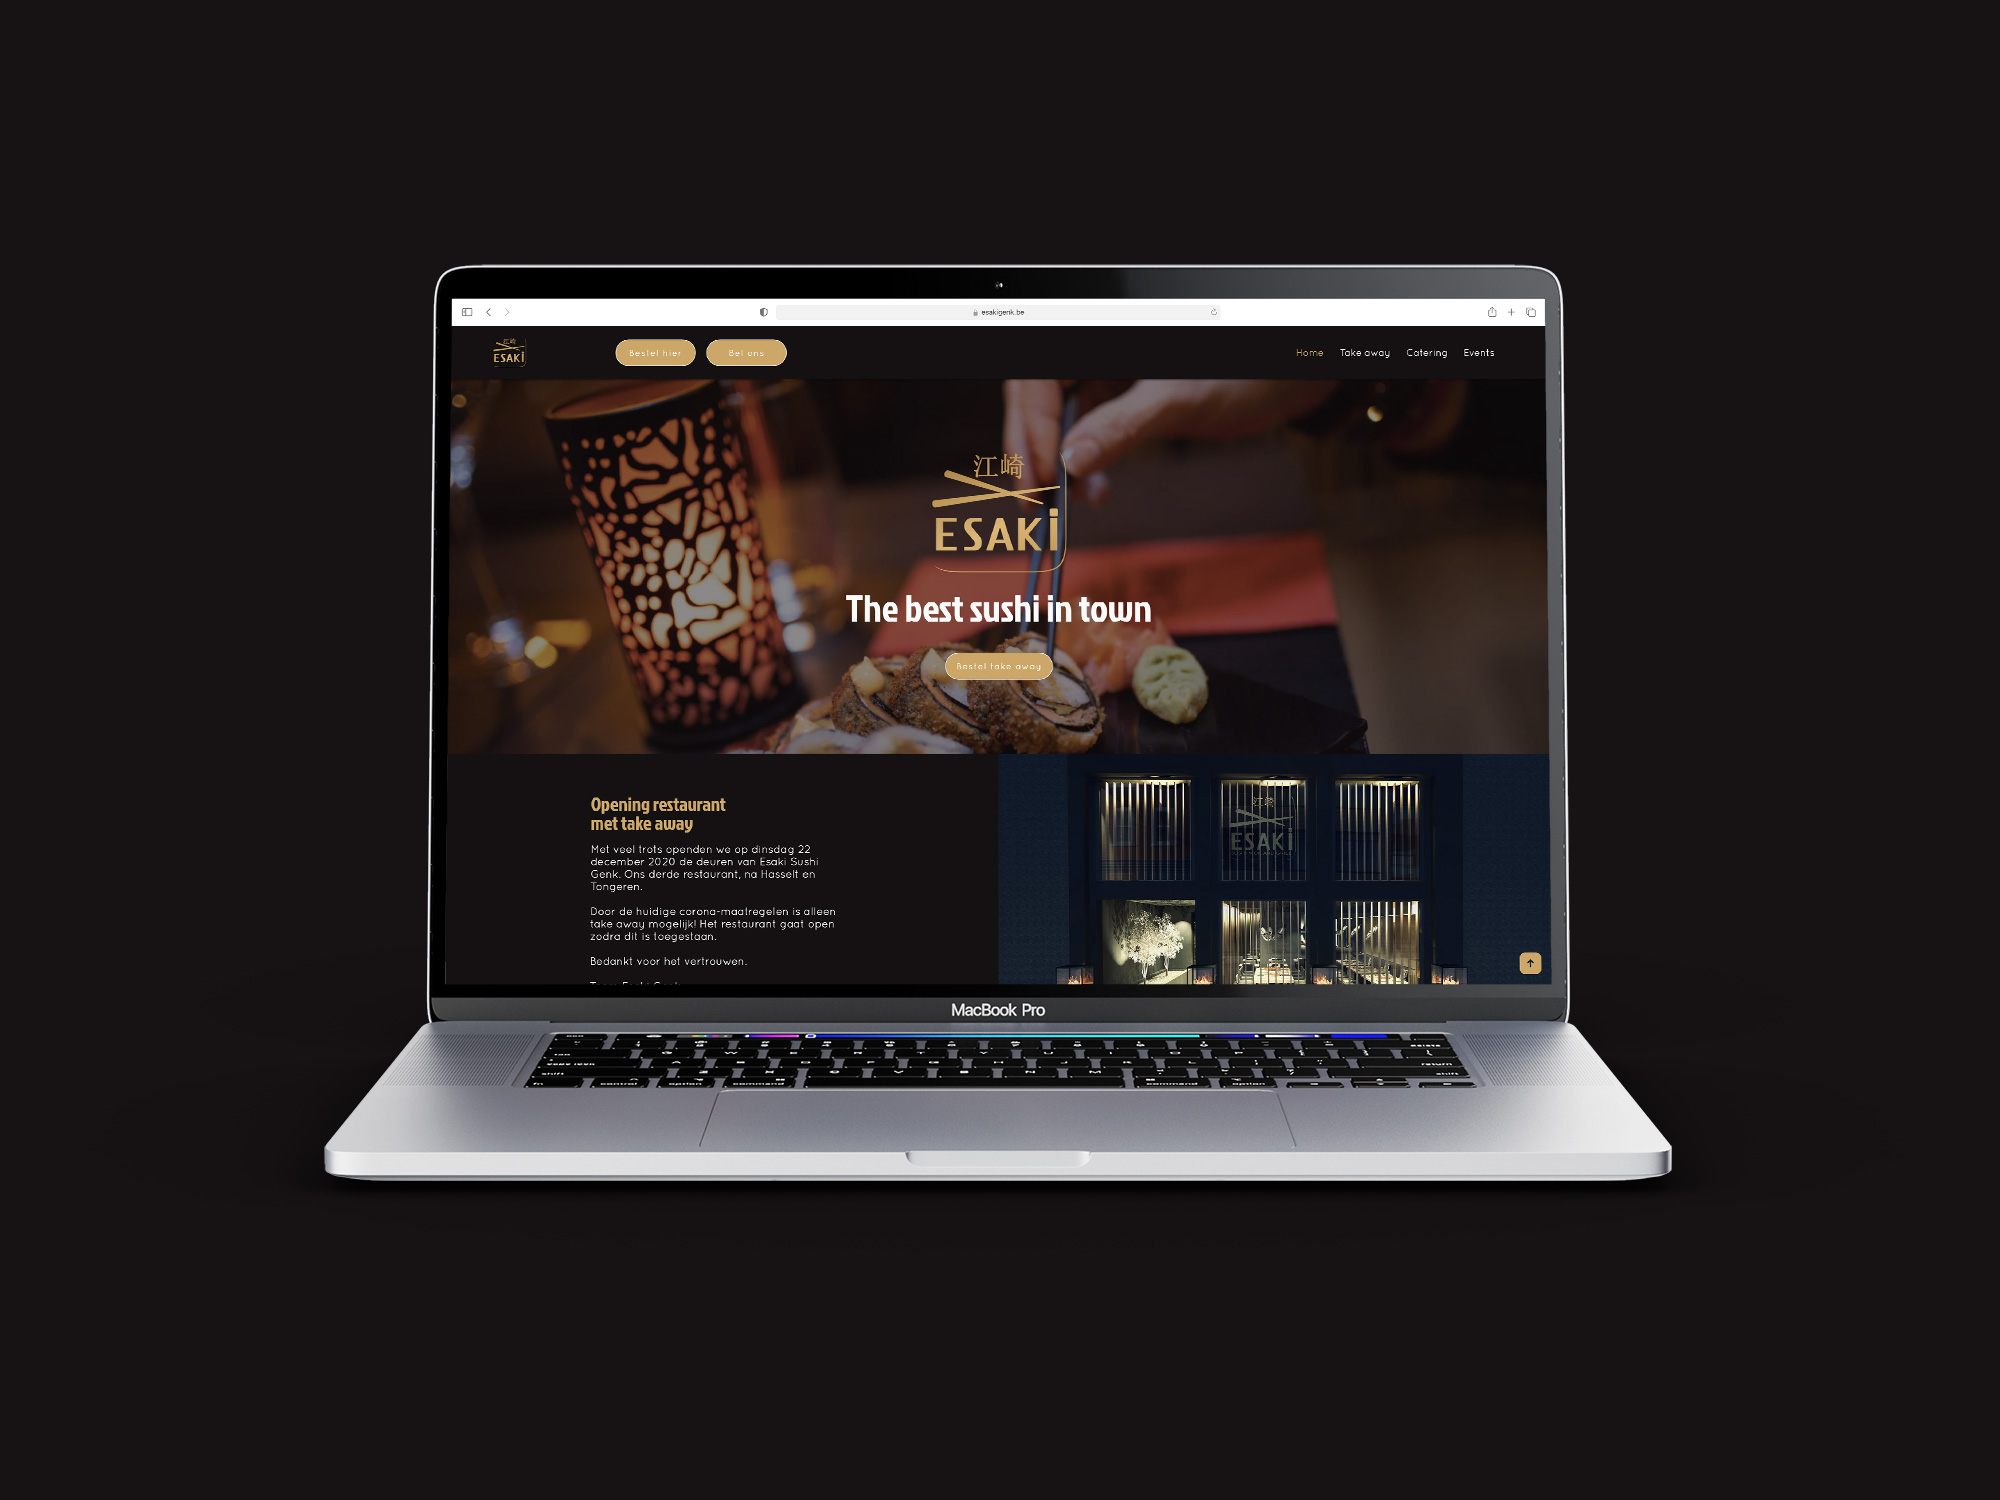 Esaki Genk ➡️ Webdesign ➡️ Take away ➡️ SEO